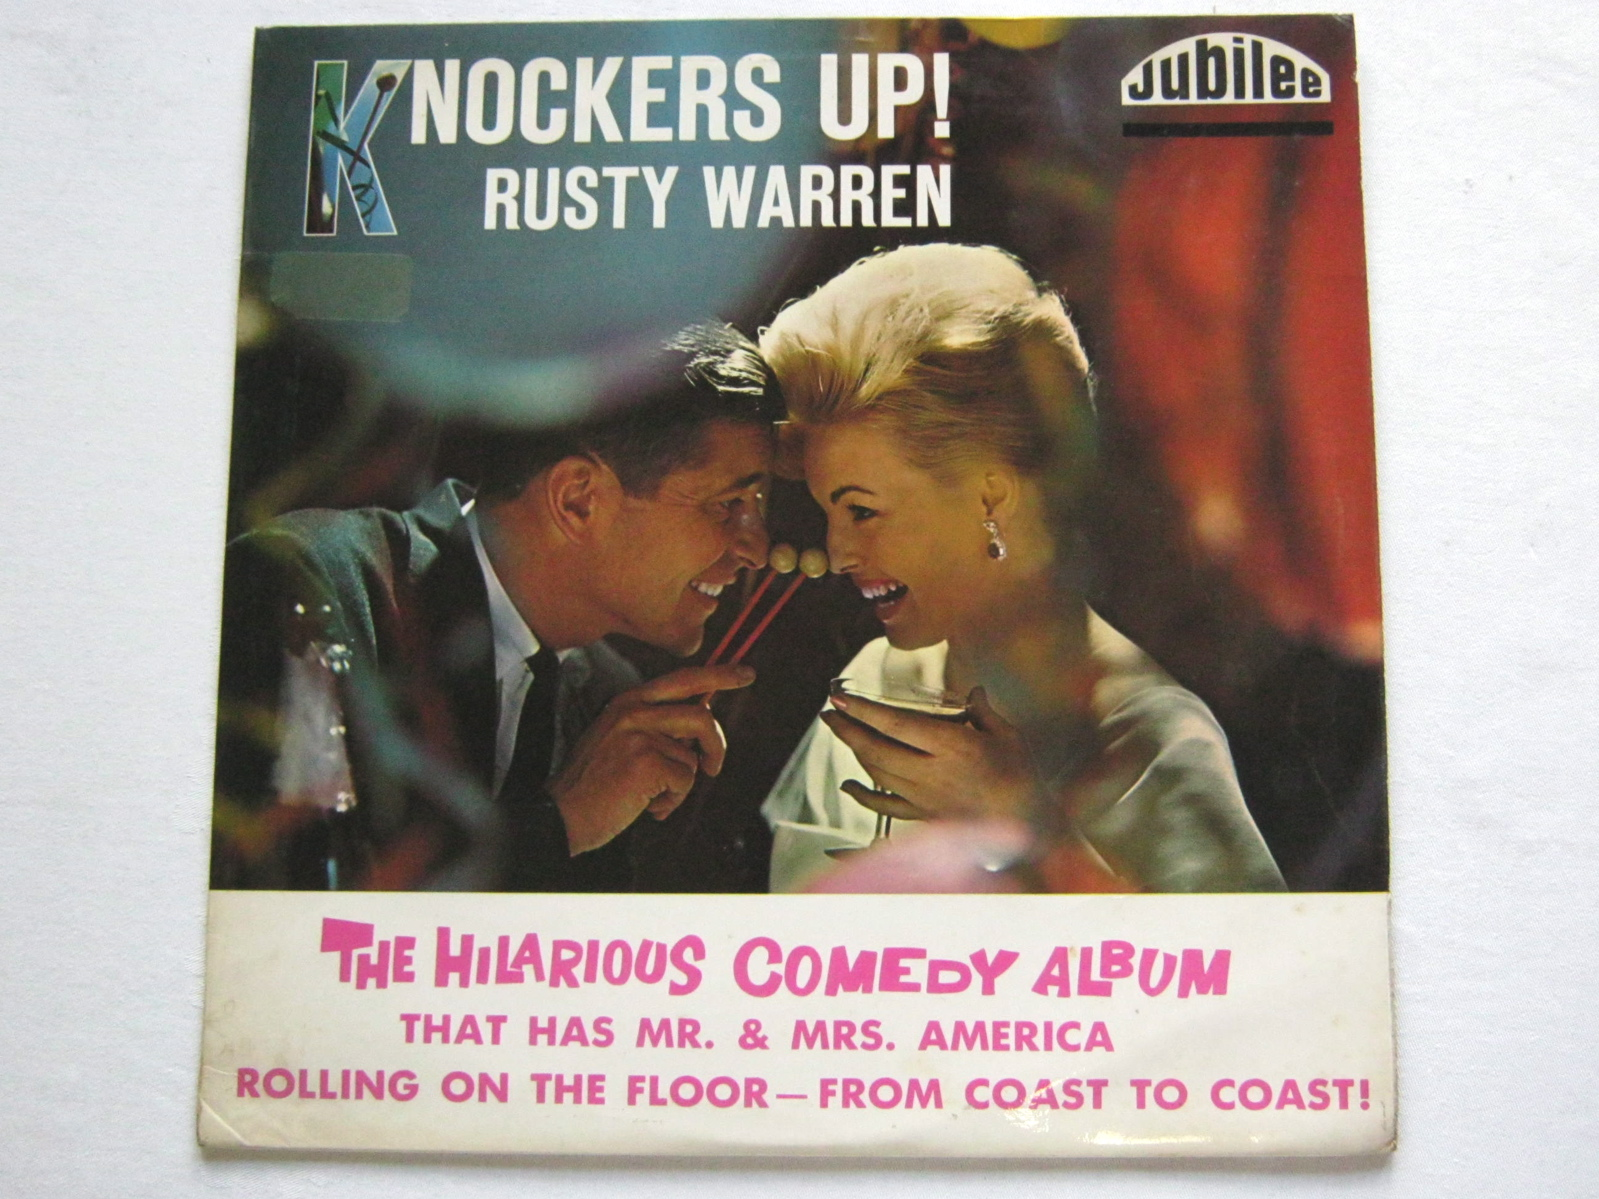 Rusty Warren - Knockers Up Record